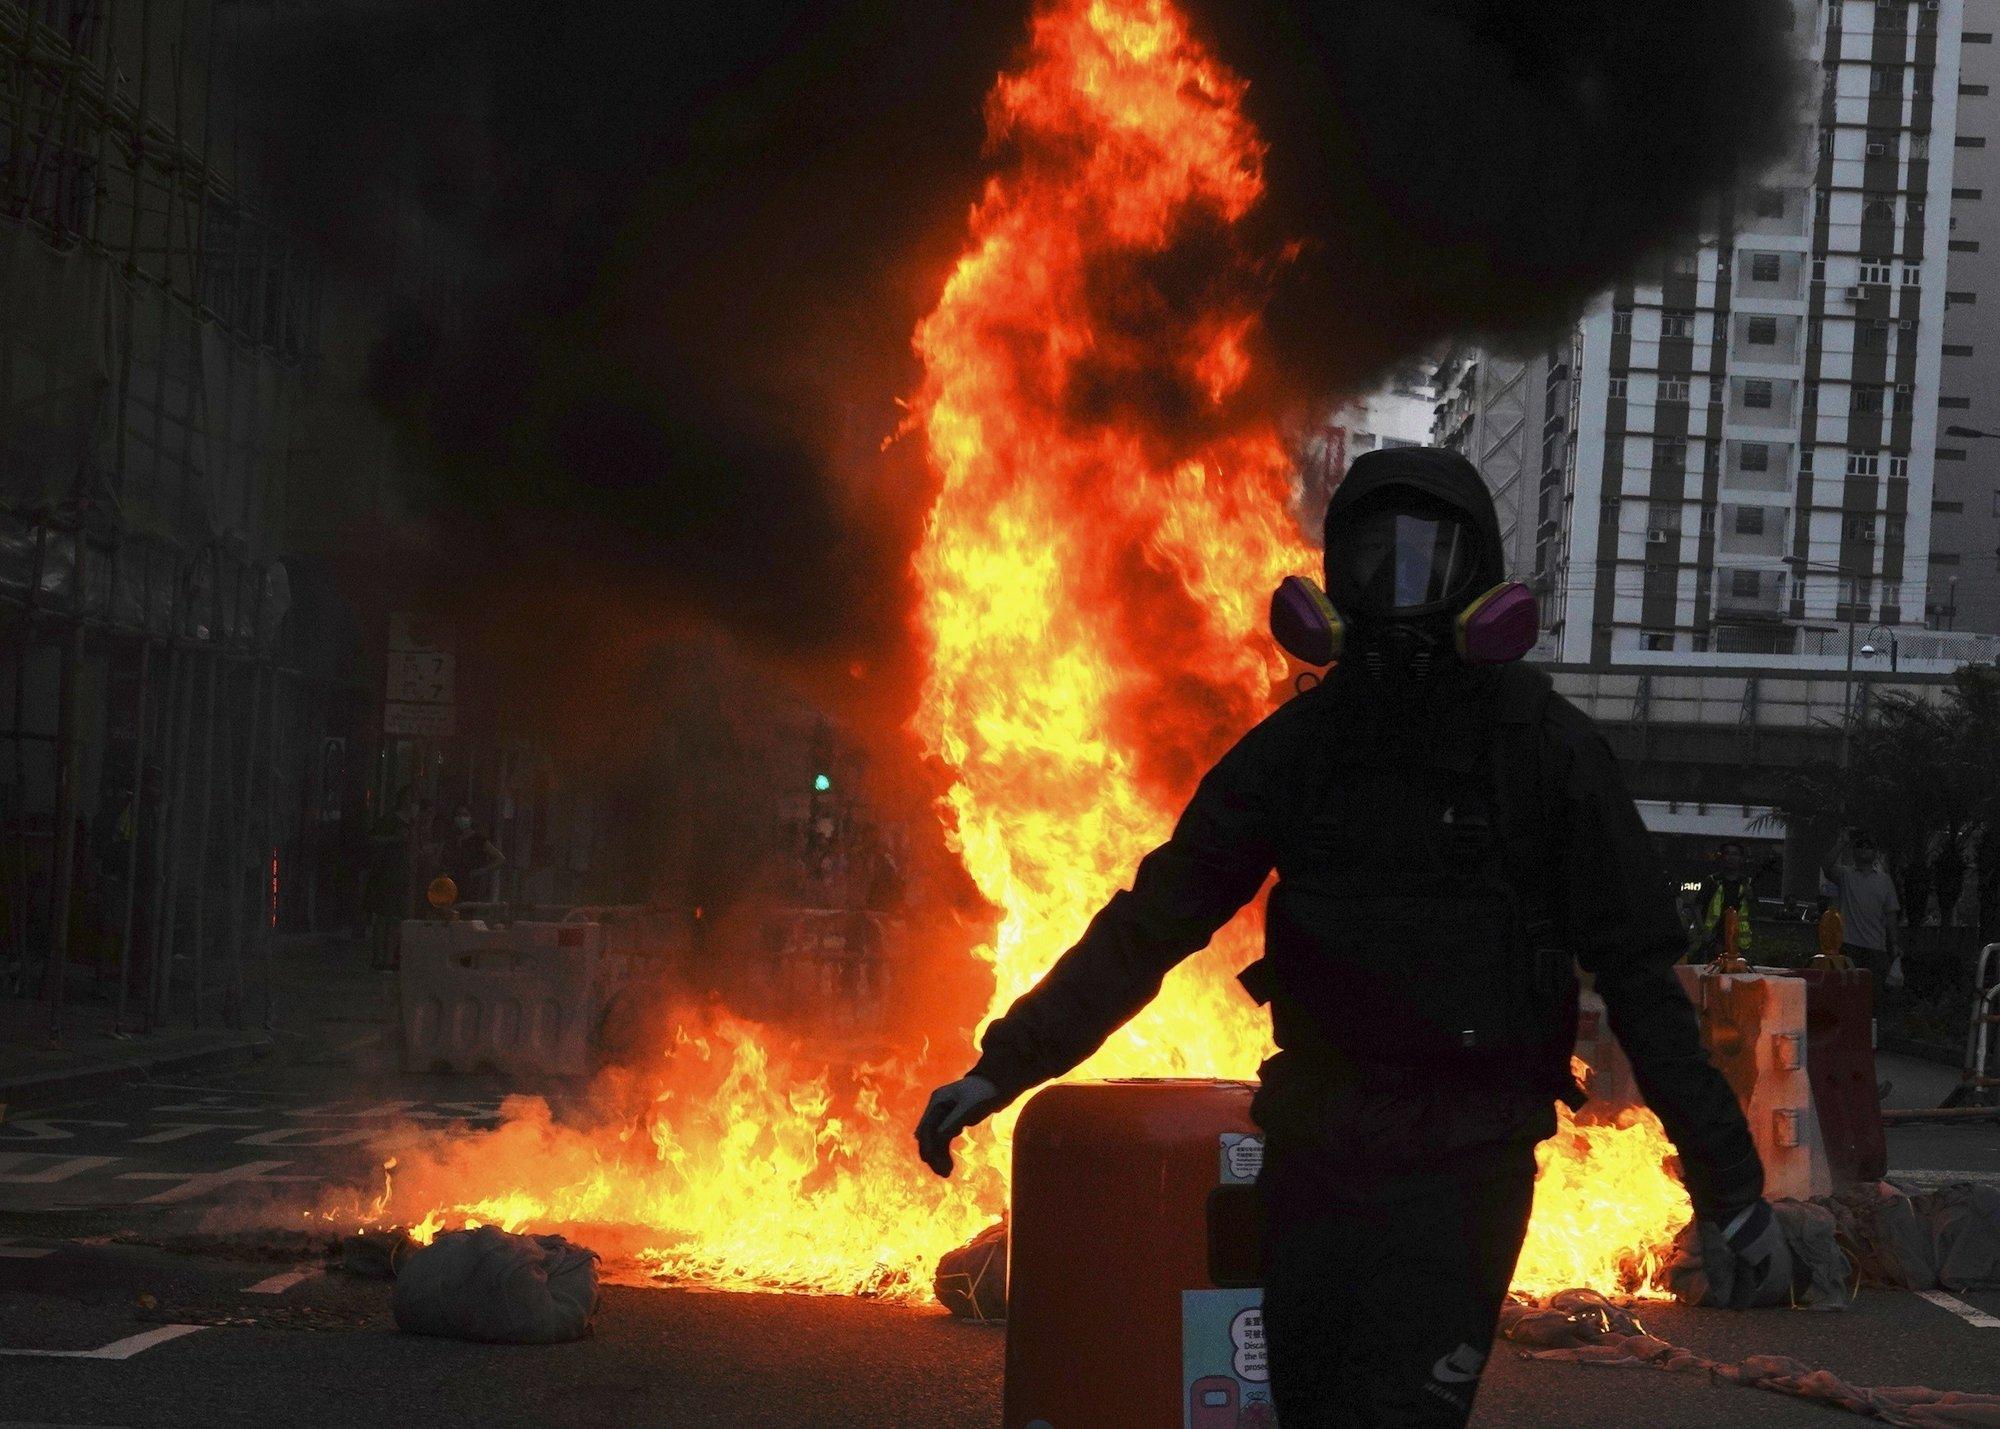 Hong Kong descends into chaos again as protesters defy ban